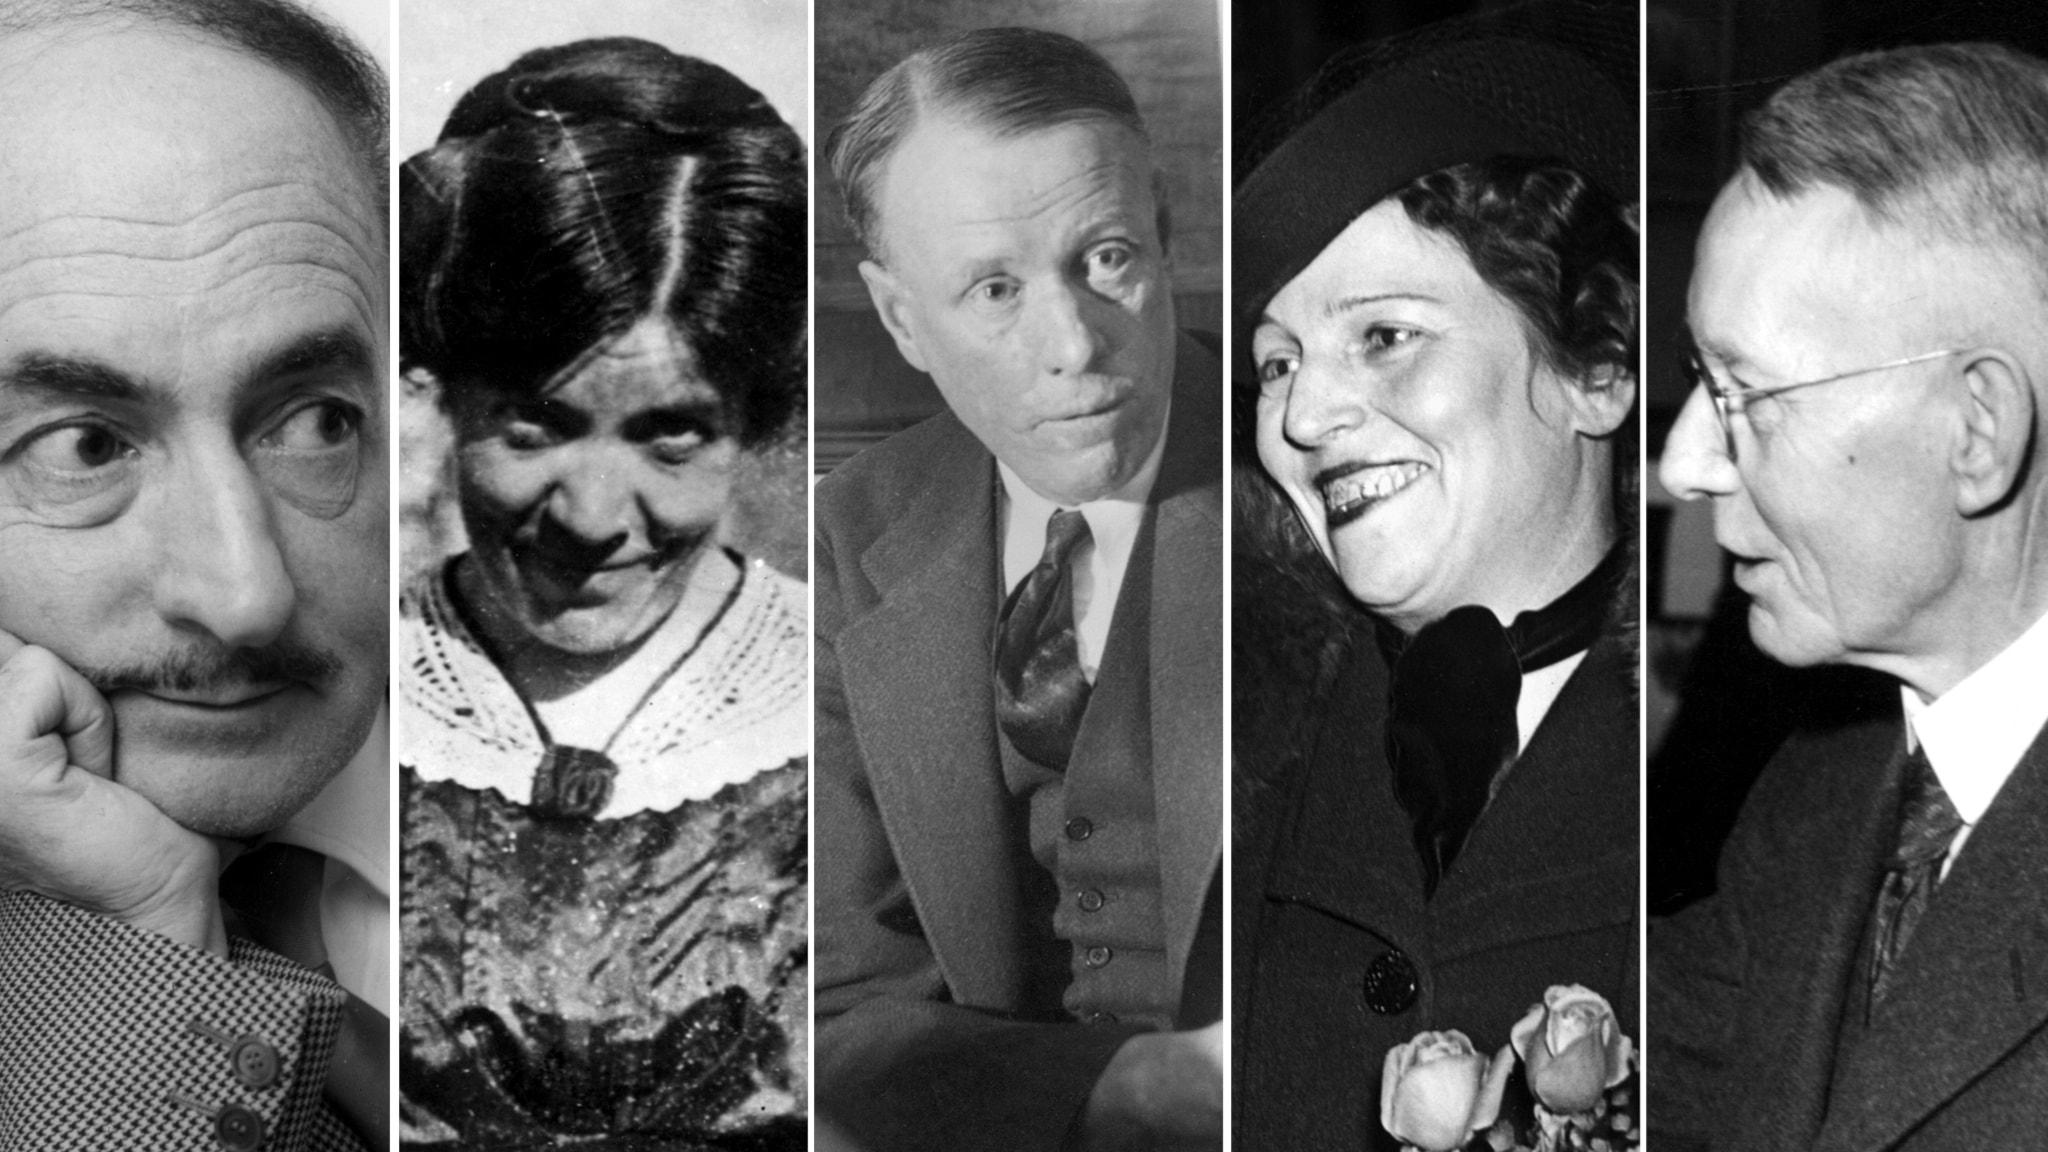 Nobelpristagare i litteratur vi borde minnas